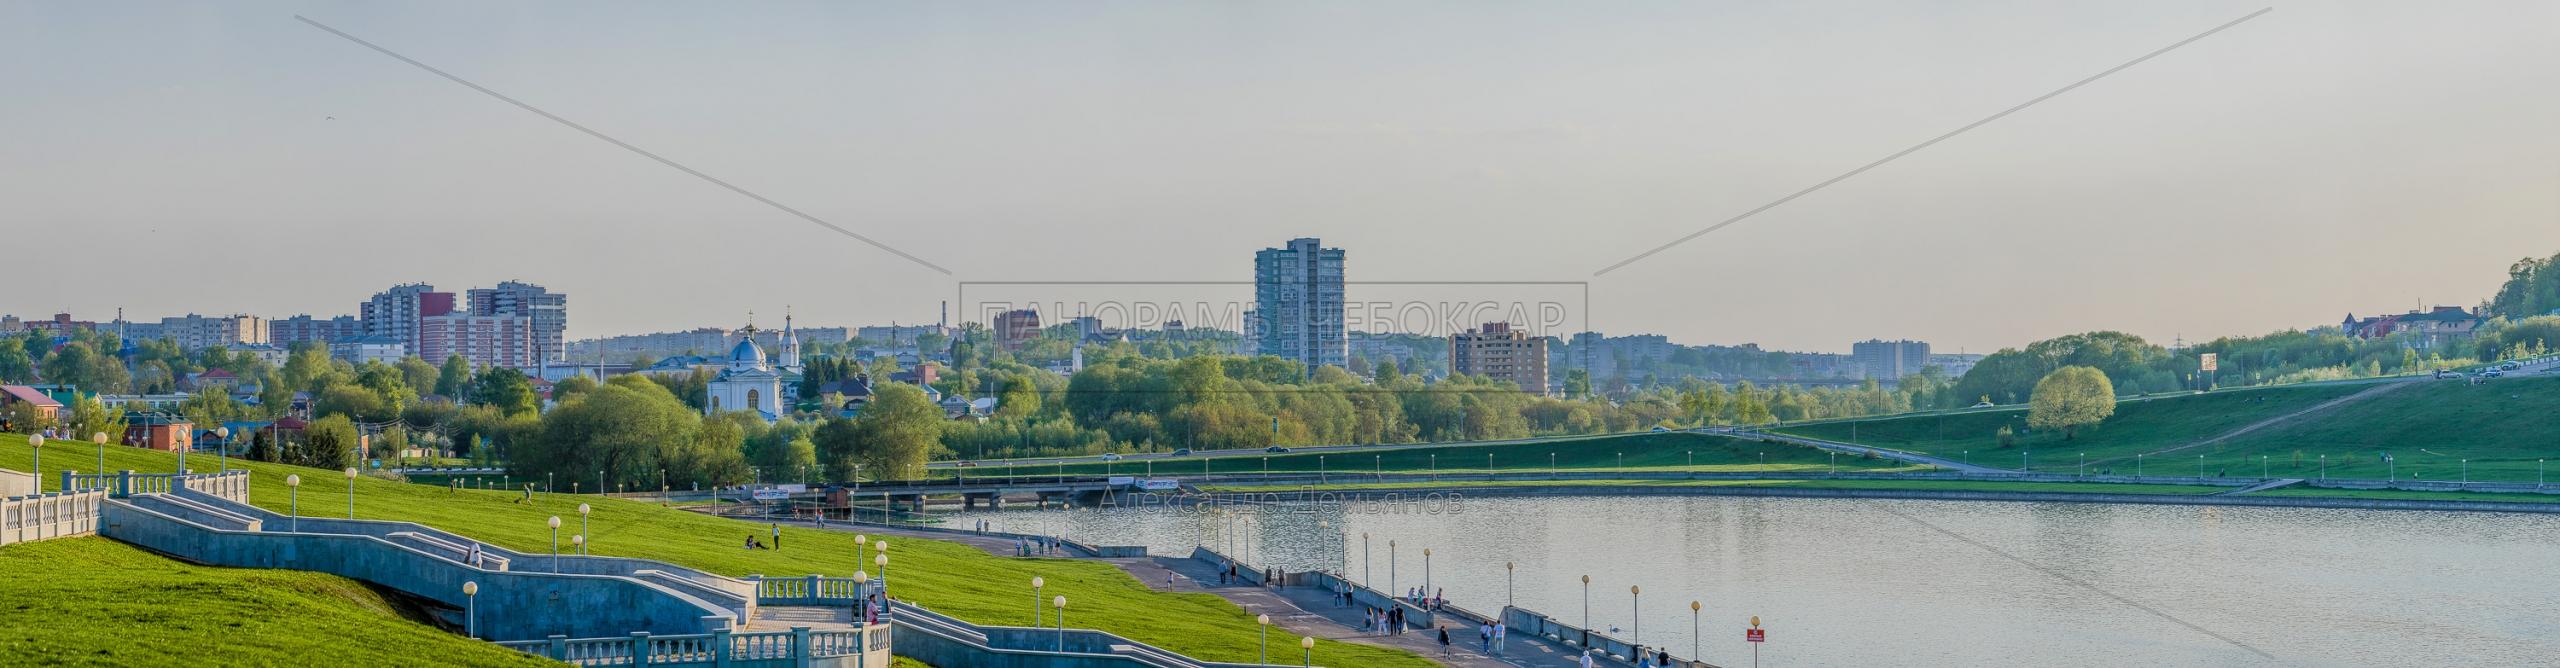 Чебоксарский залив Весной 2019 II